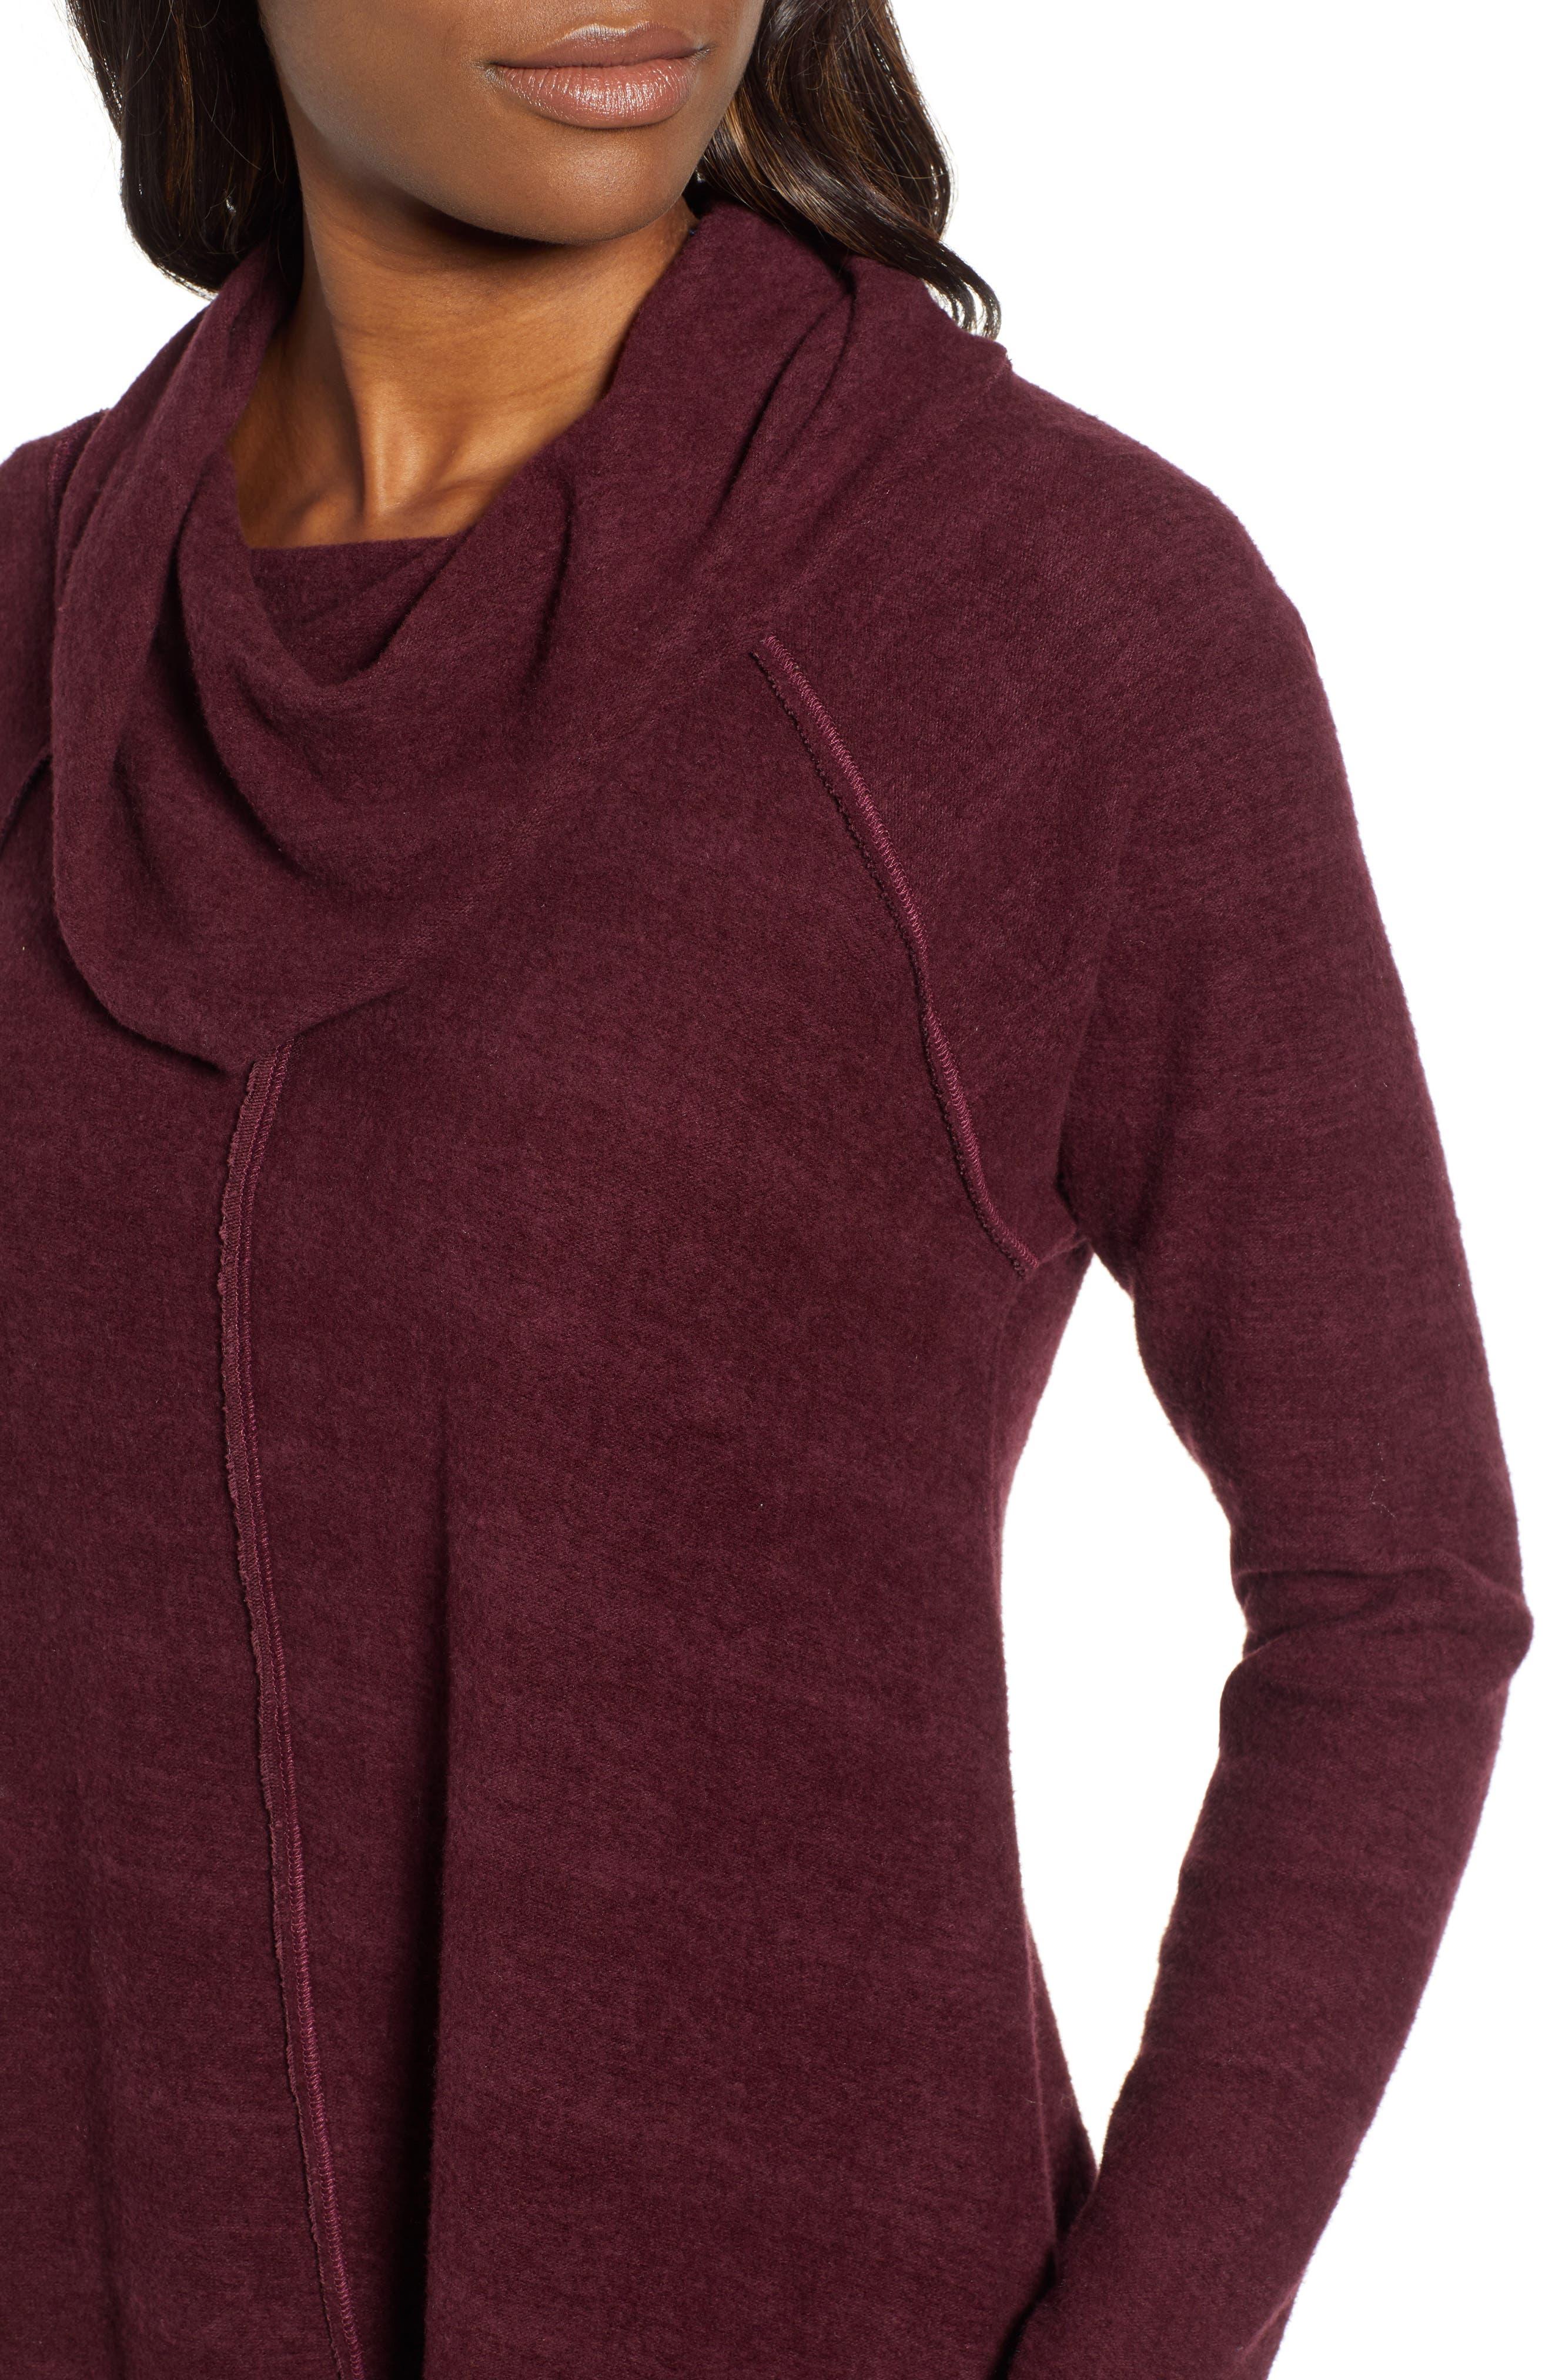 Knit Cowl Neck Tunic,                             Alternate thumbnail 4, color,                             930